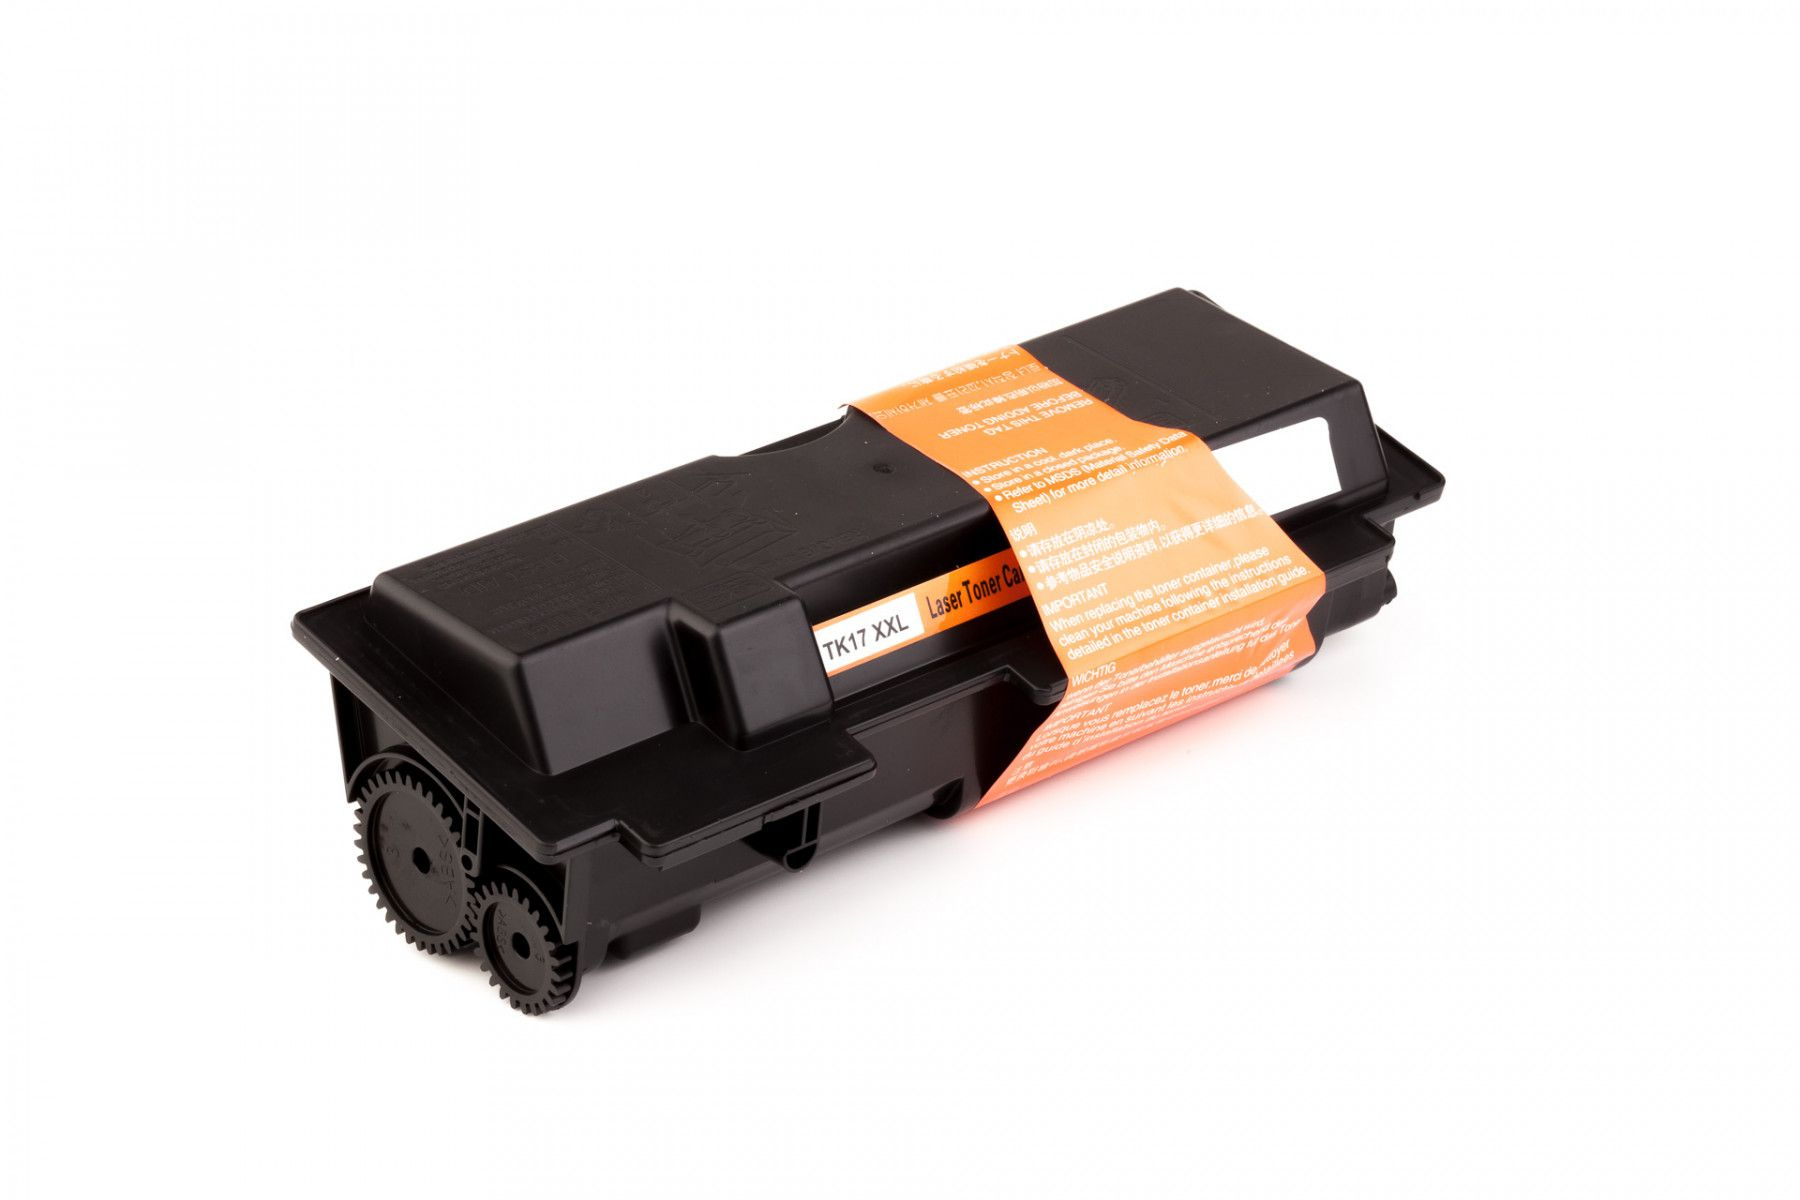 Toner compatível com KYOCERA TK172 FS1370 P2135 FS1320 FS1370DN P2135DN FS1320D 7.200 Páginas - Cartucho & Cia